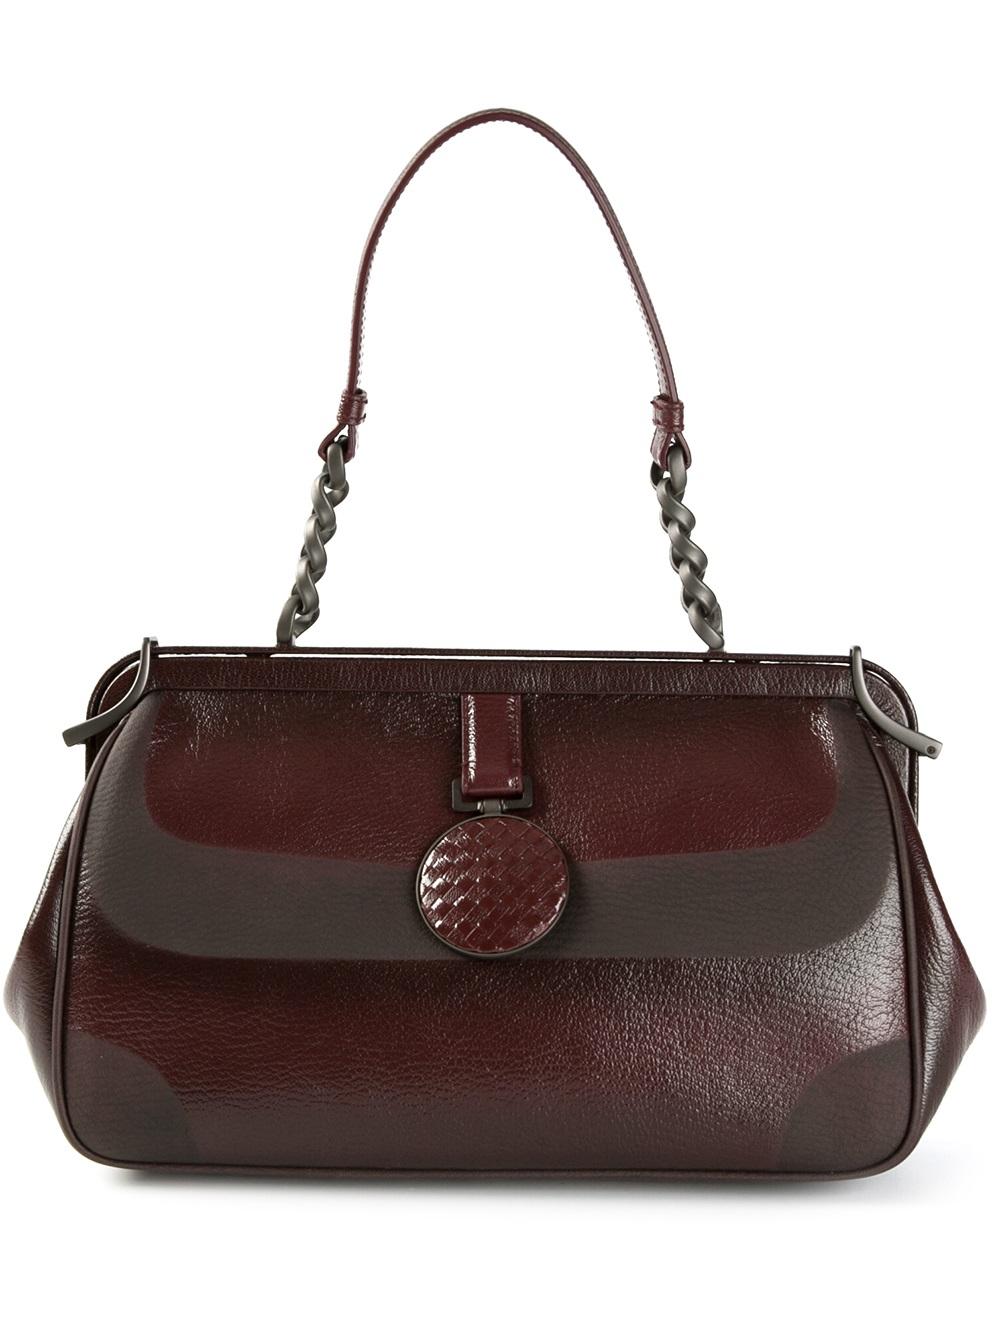 Replica Bottega Veneta Handbags, Bottega Veneta Fake Bags ...